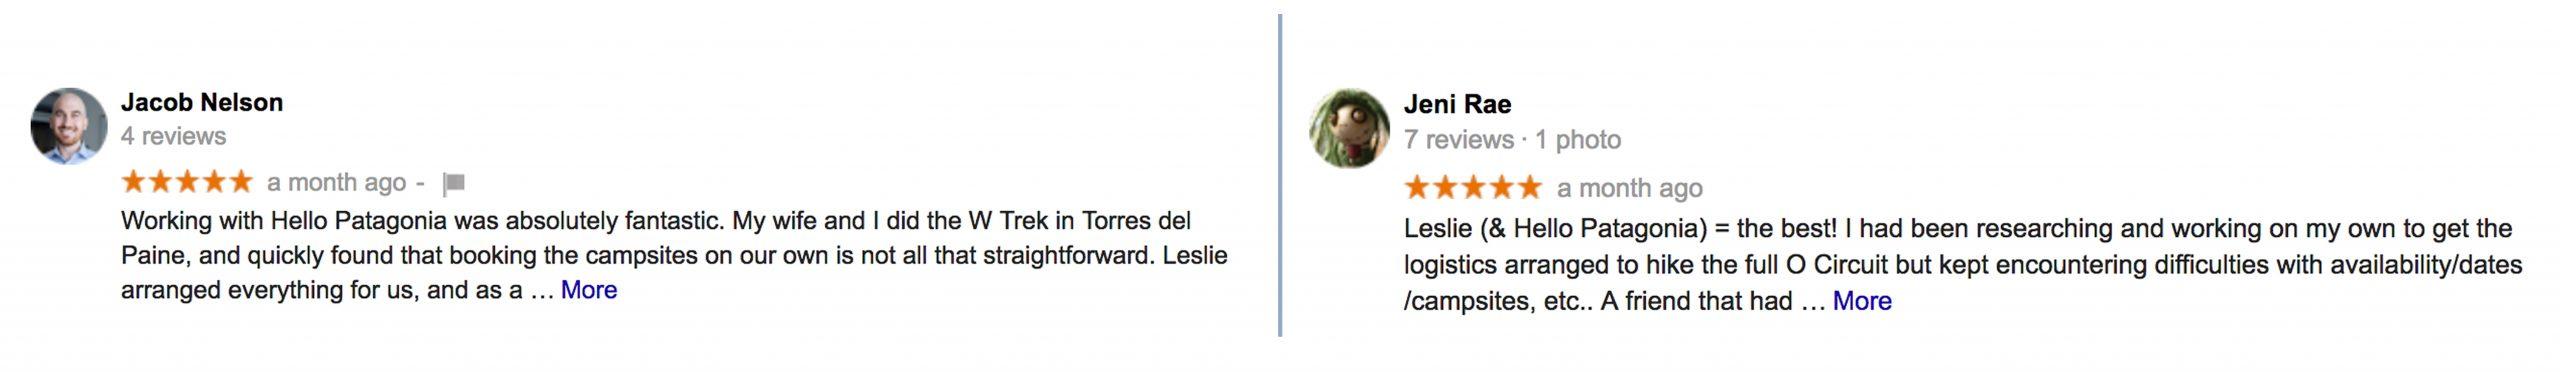 Hello Patagonia Reviews